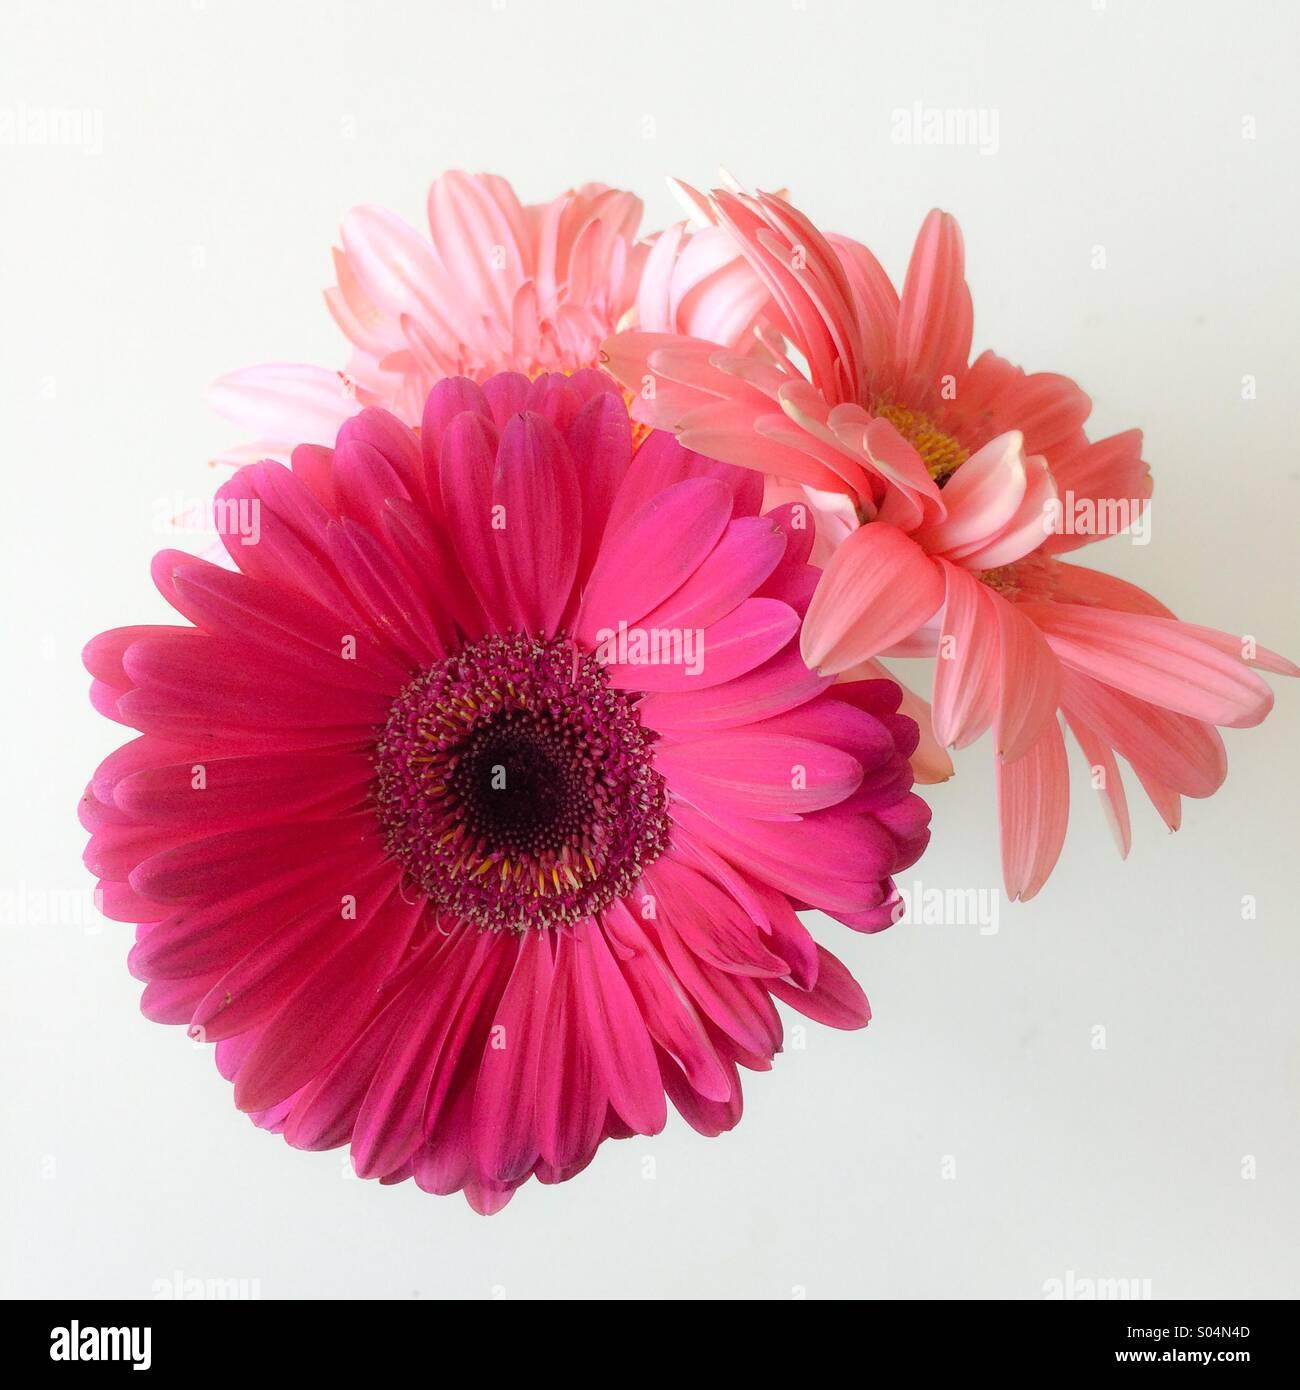 Trois gerber daisies Photo Stock